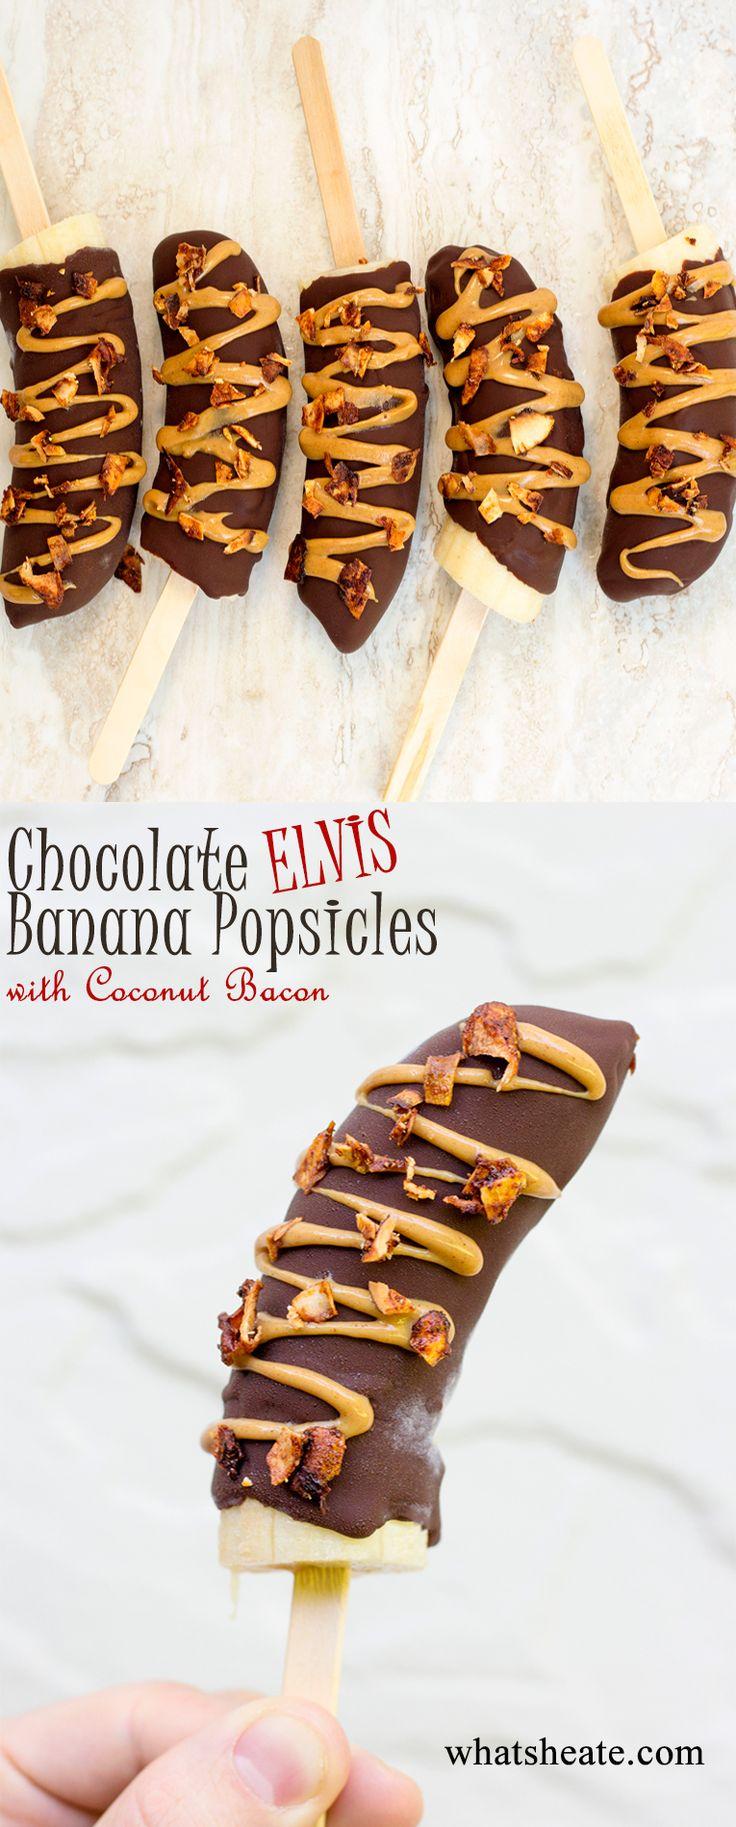 Chocolate Elvis Banana Popsicles #vegan #glutenfree #recipe